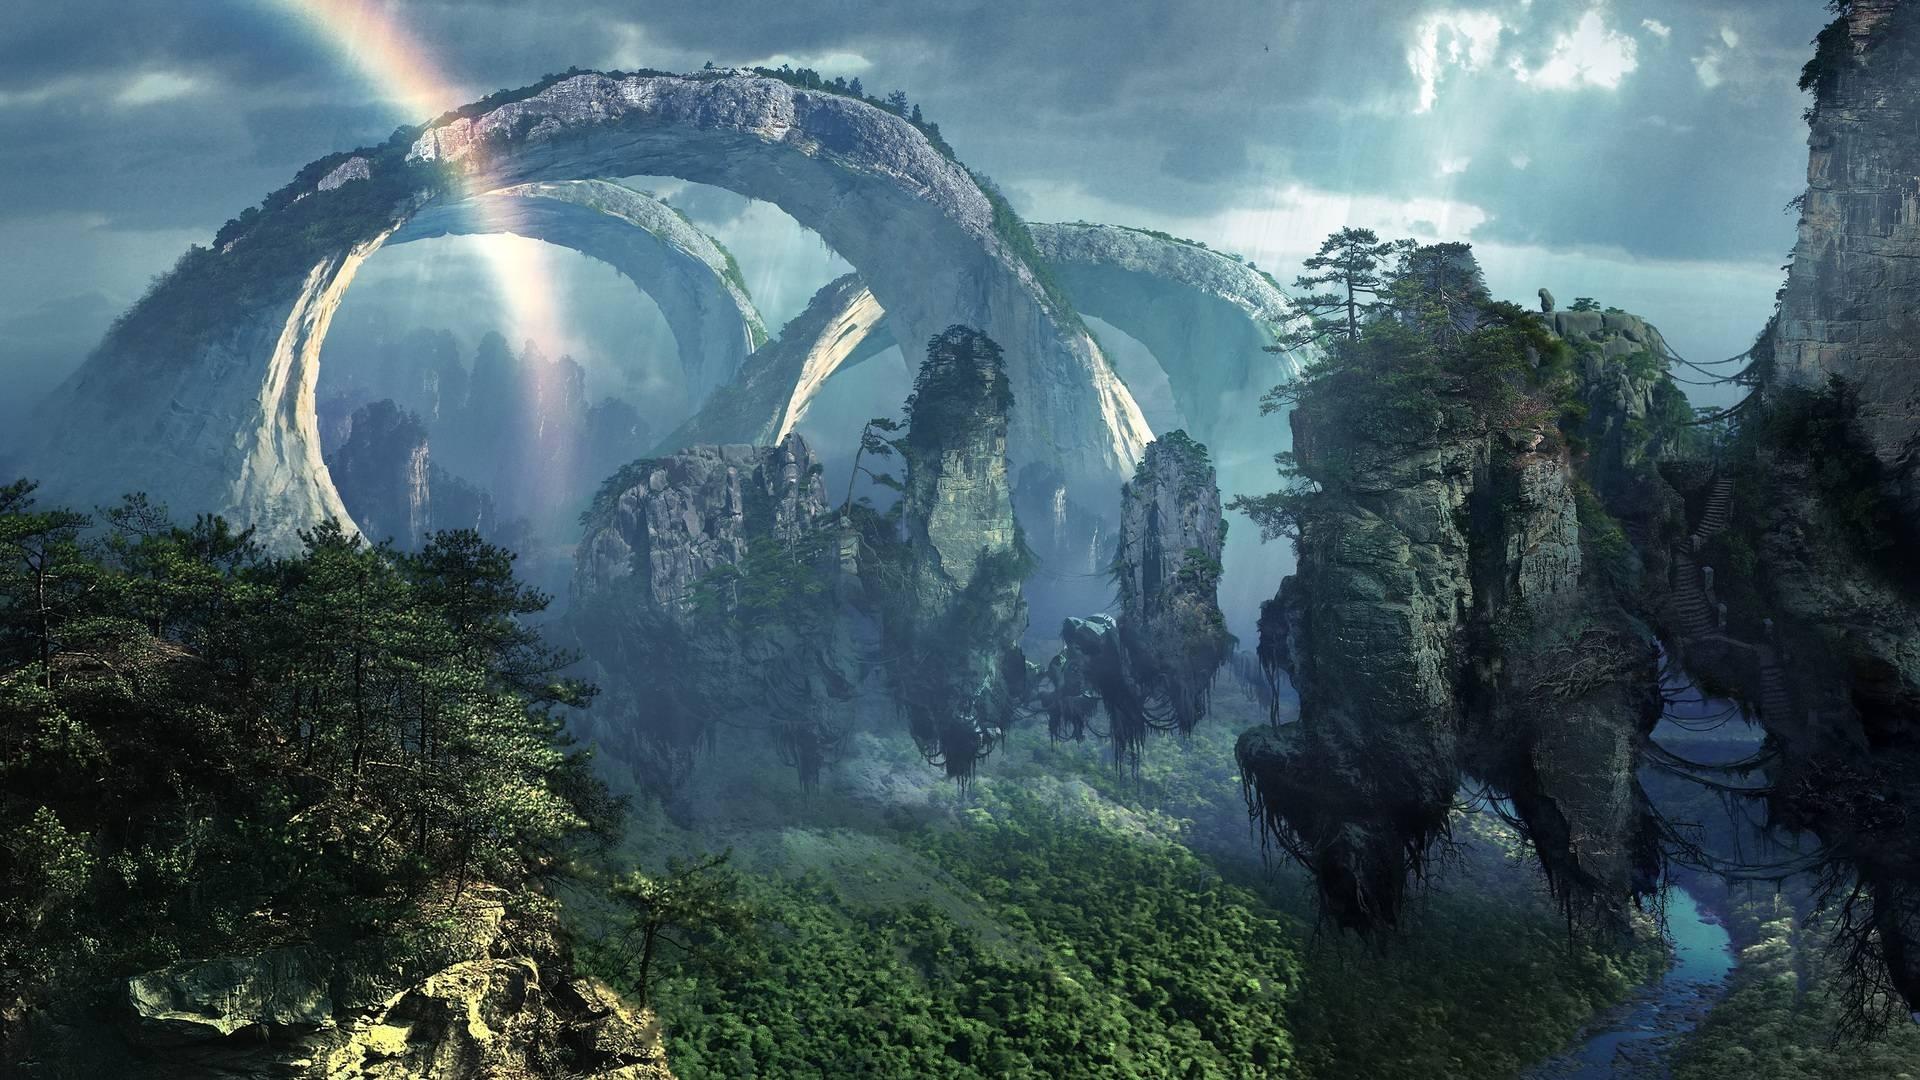 epic fantasy wallpaper desktop free download > subwallpaper